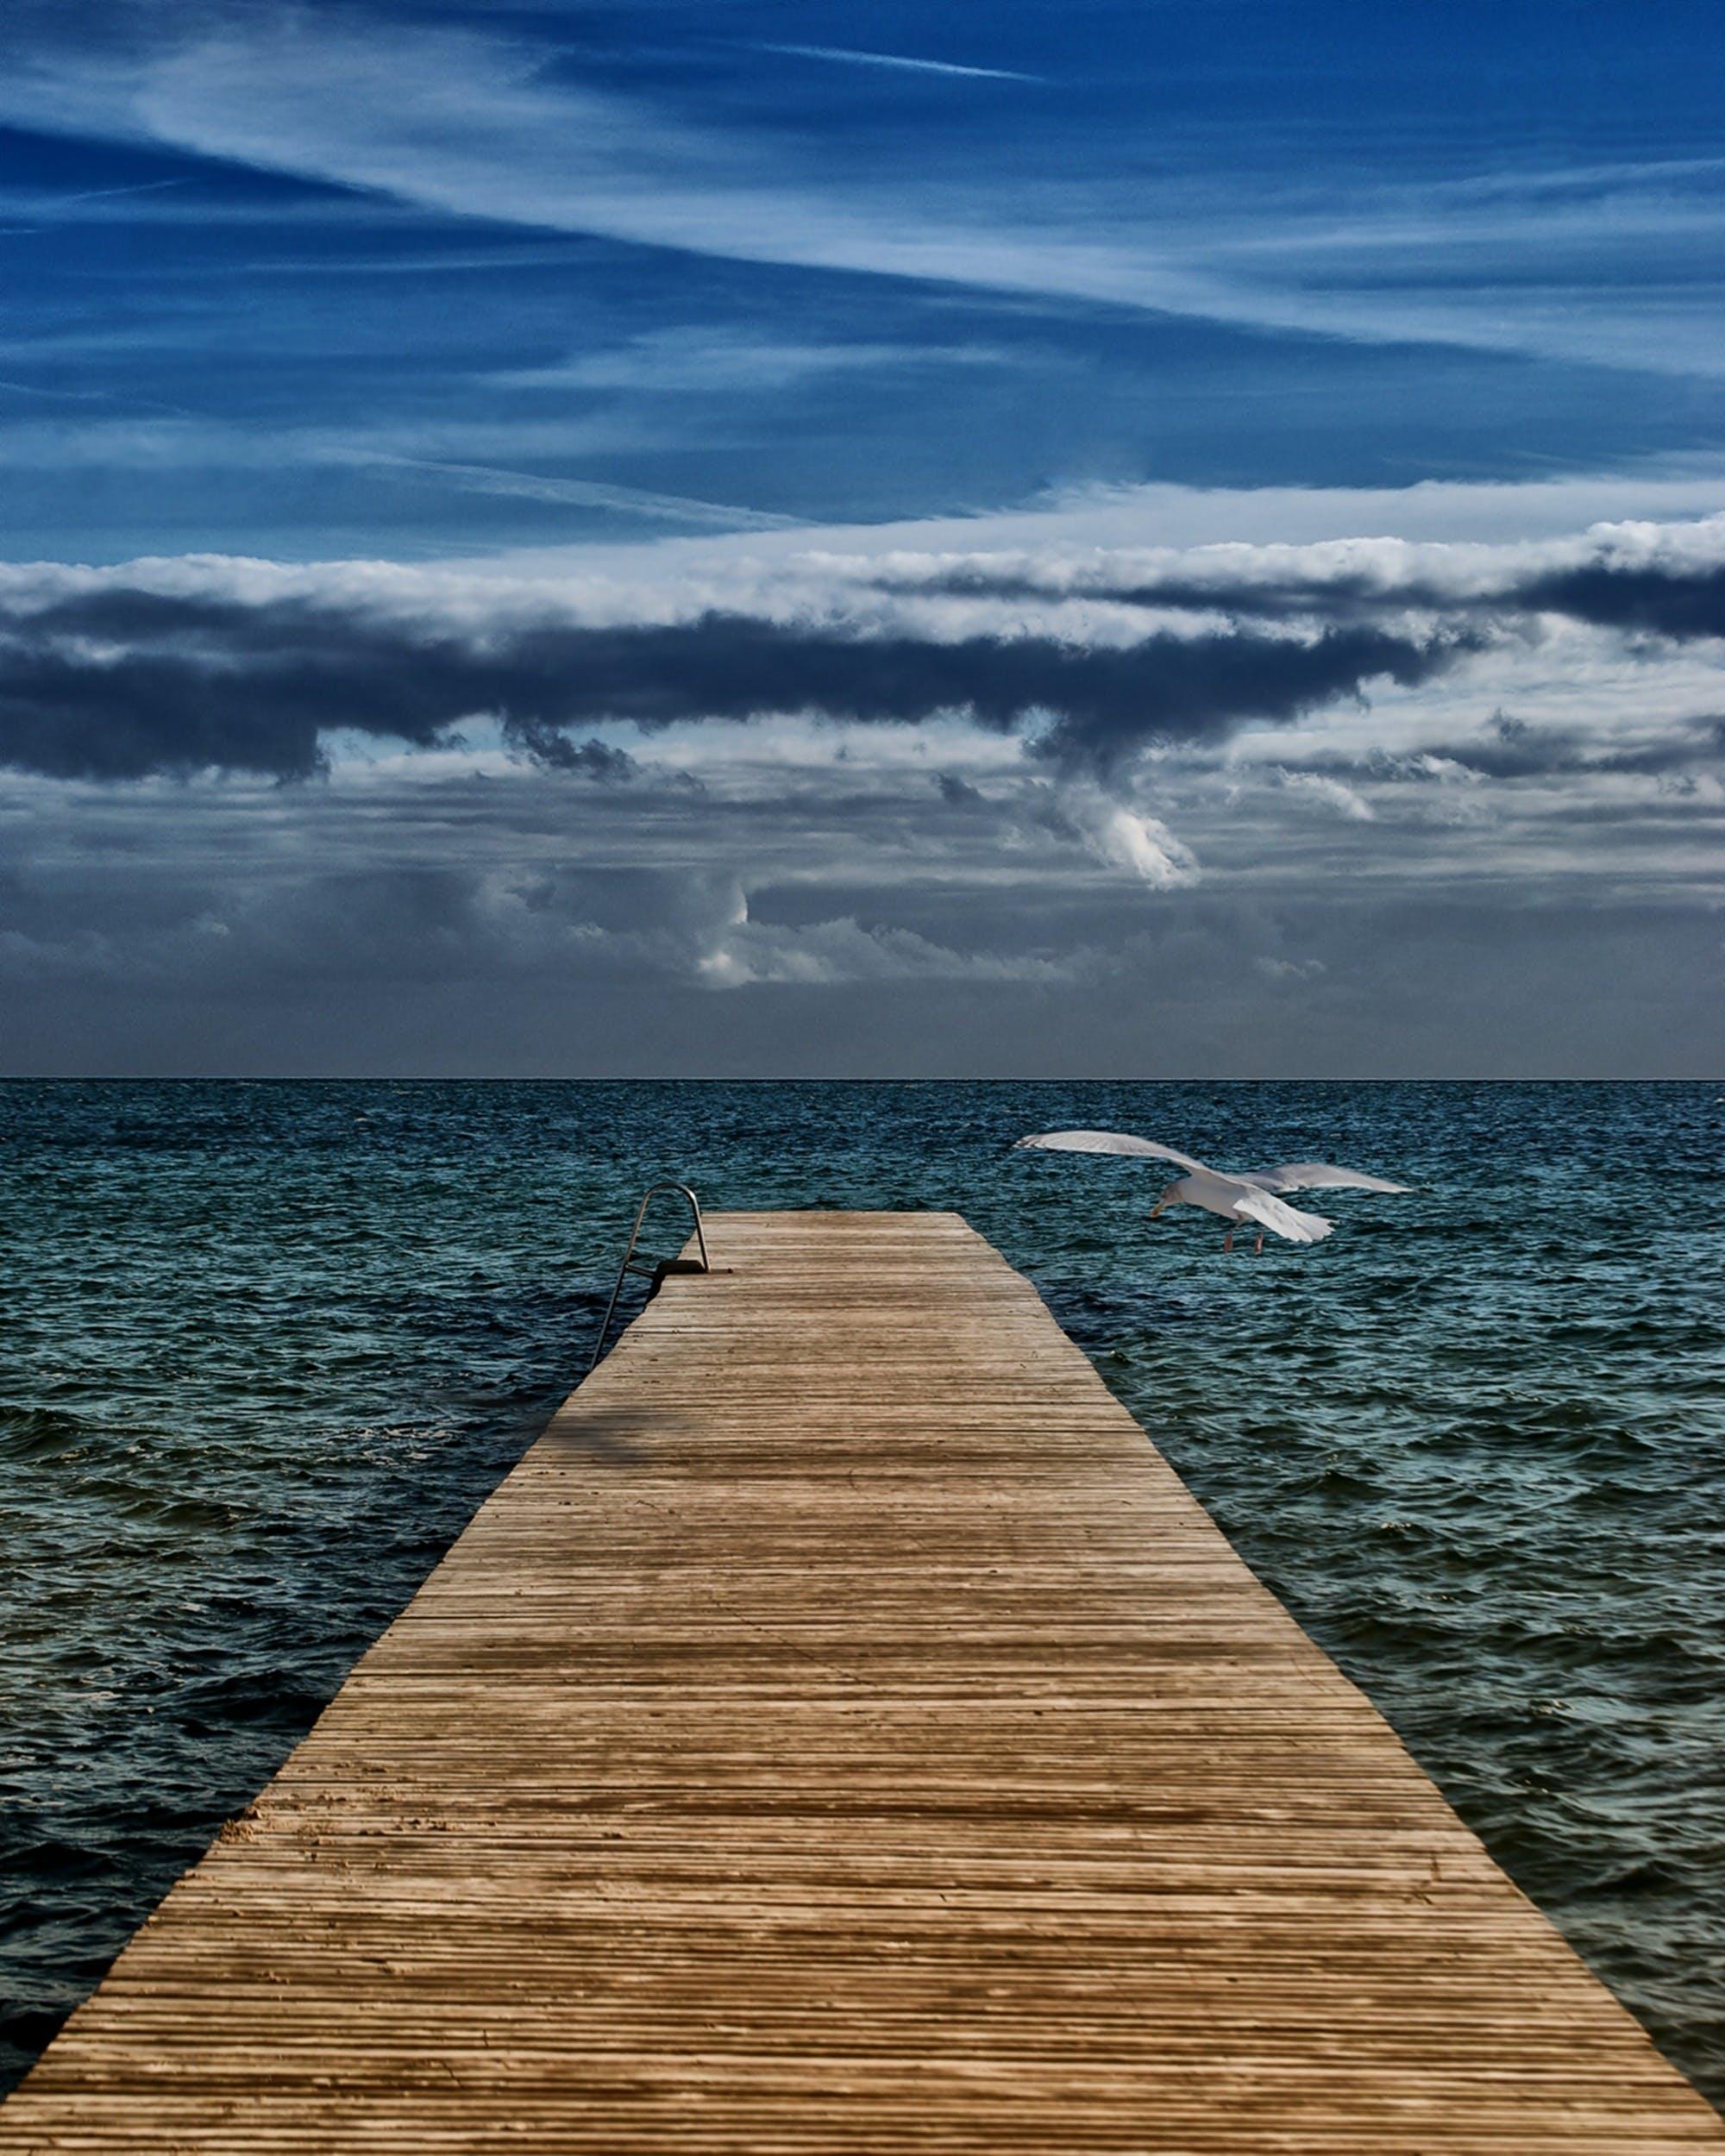 bird, blue sky, boardwalk